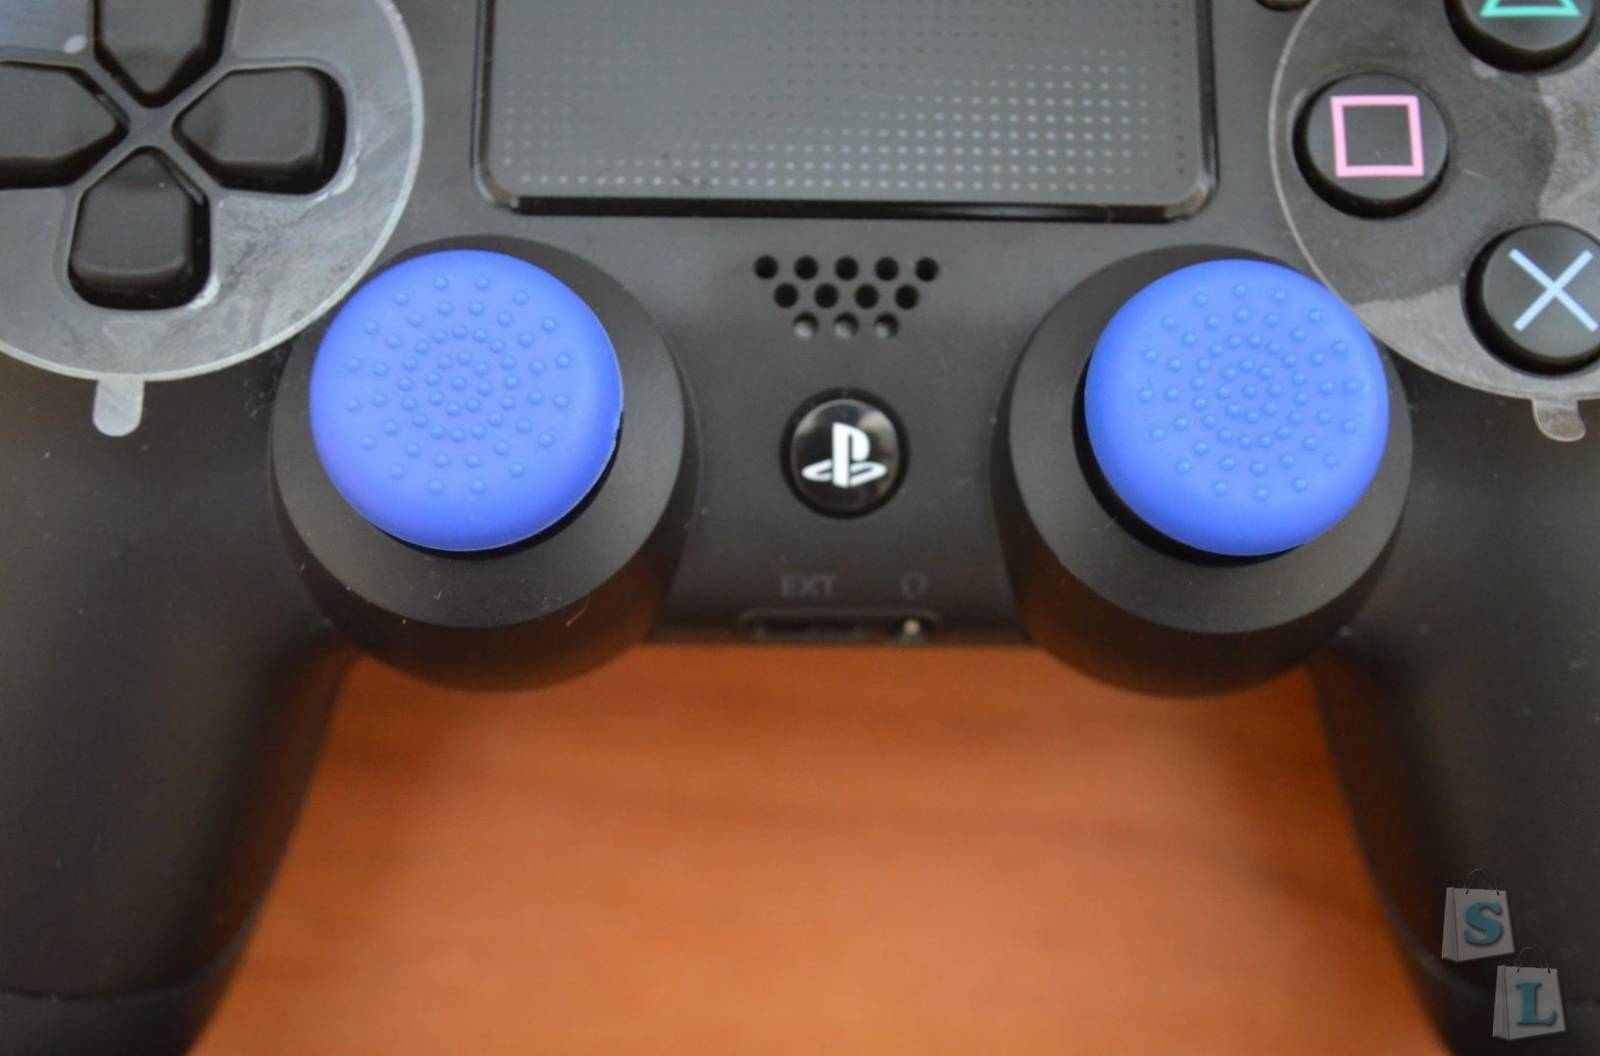 Miniinthebox: Аксессуары для Sony PS4 - подставка и накладки на джойстики